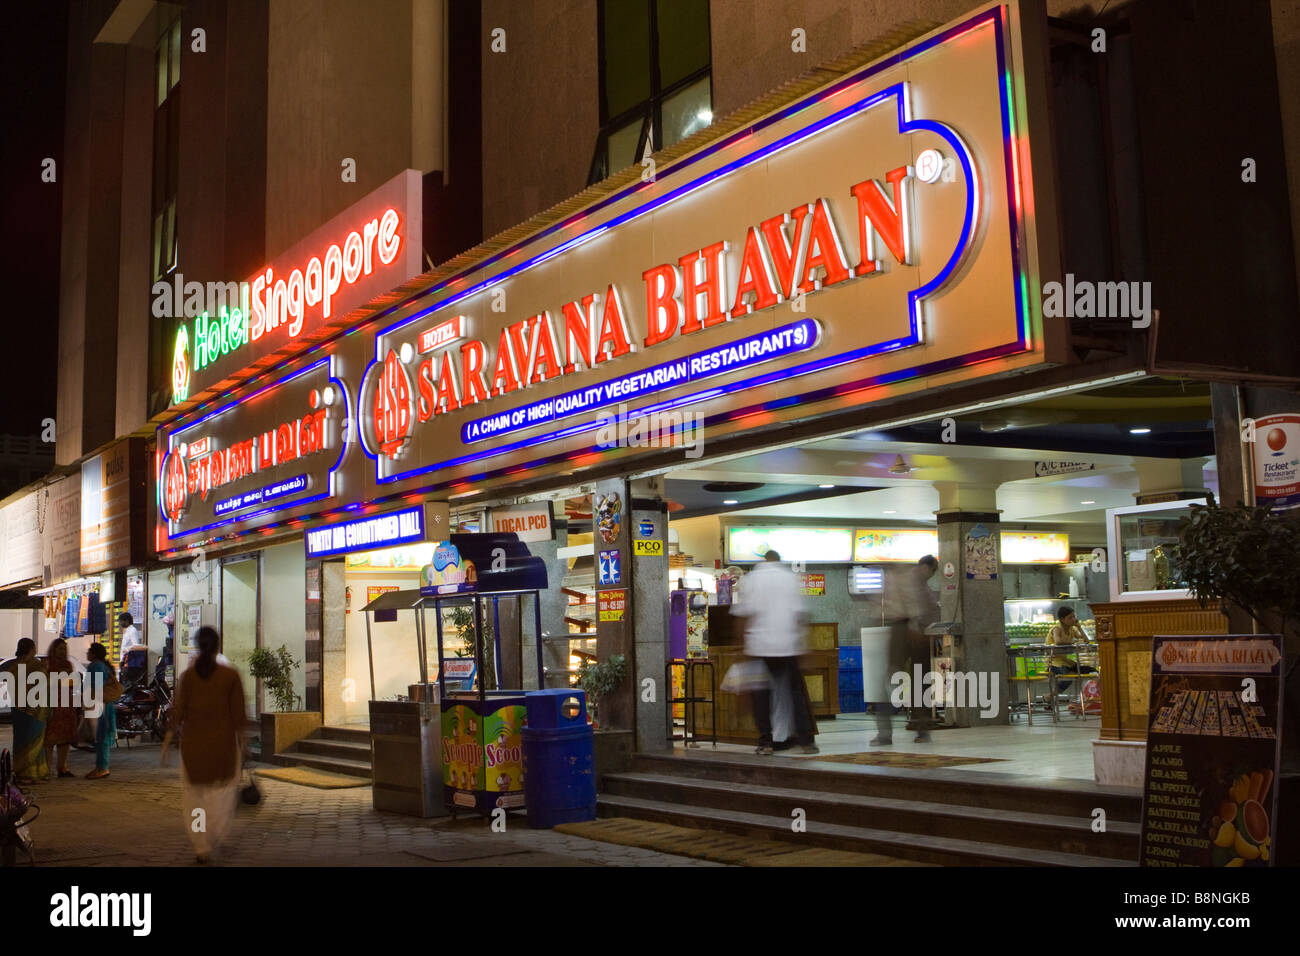 Multiplex Definition India Tamil Nadu Chennai Egmore Saravana Bhavan Restaurant